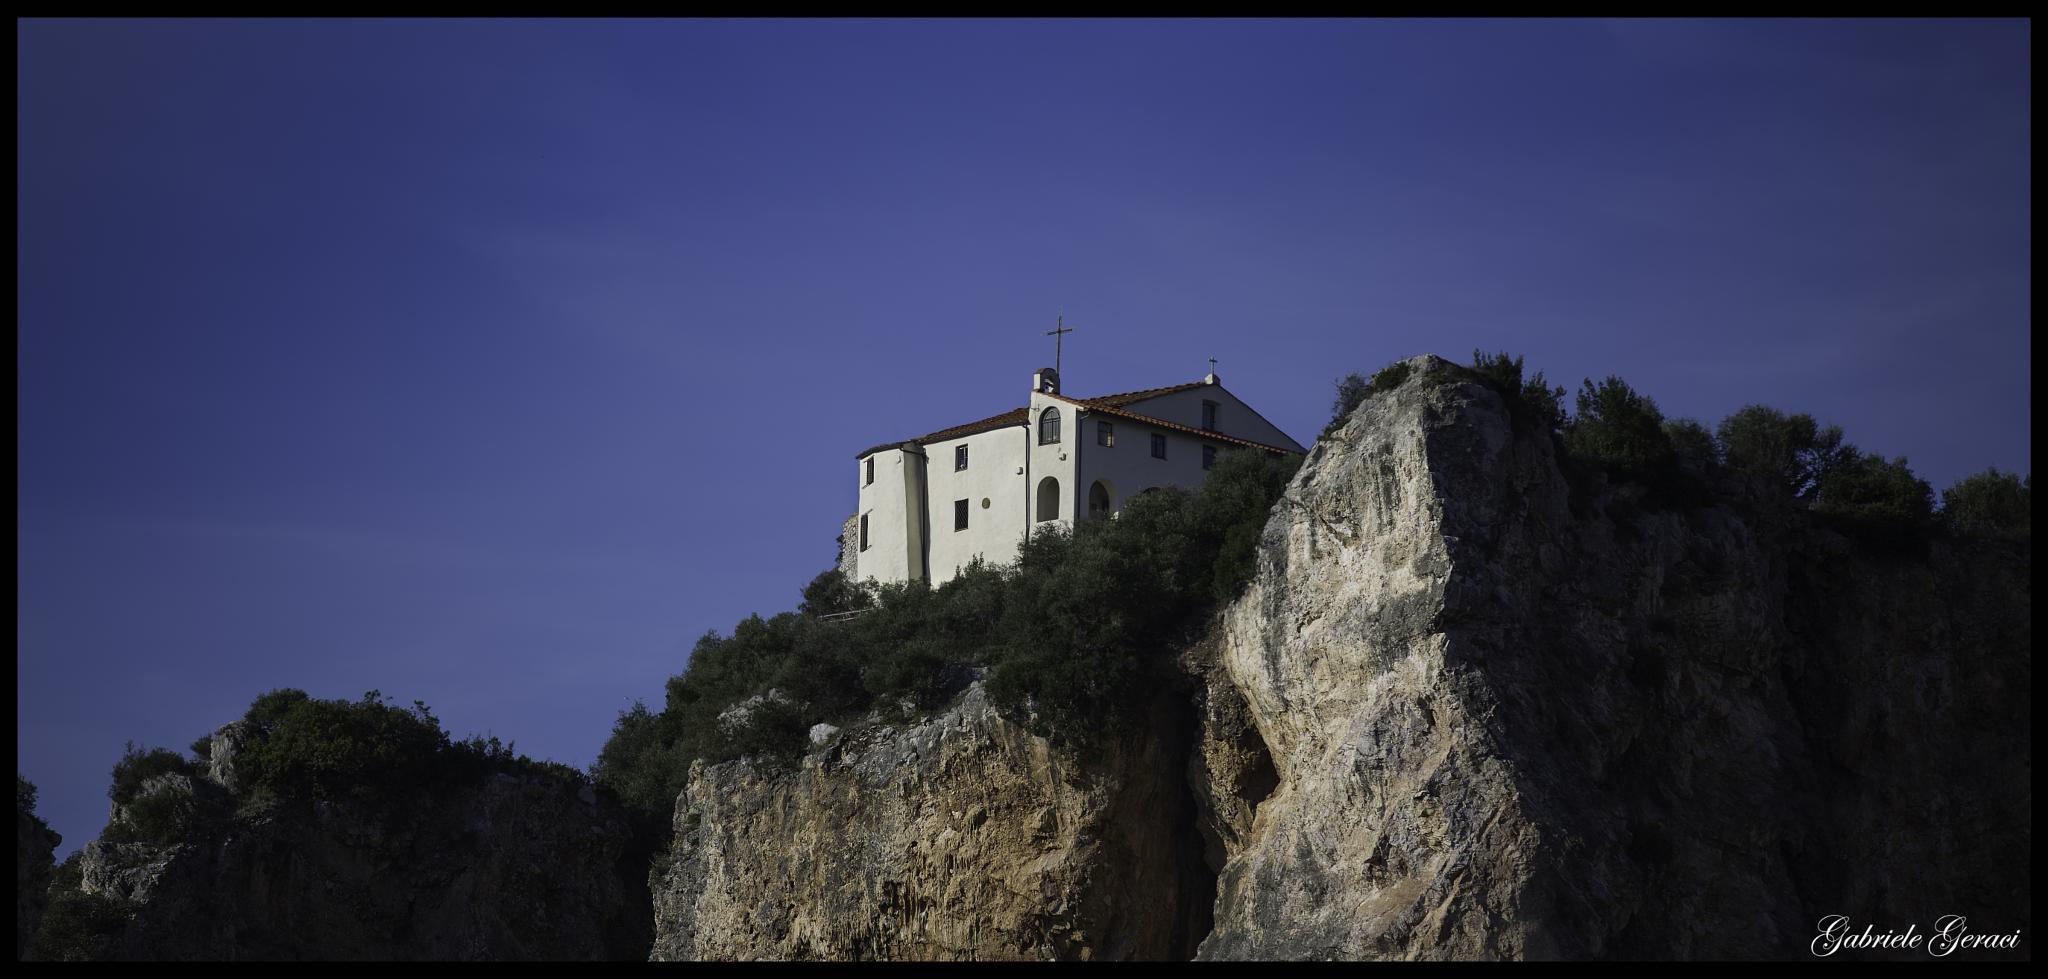 Il Castello by Gabriele Geraci